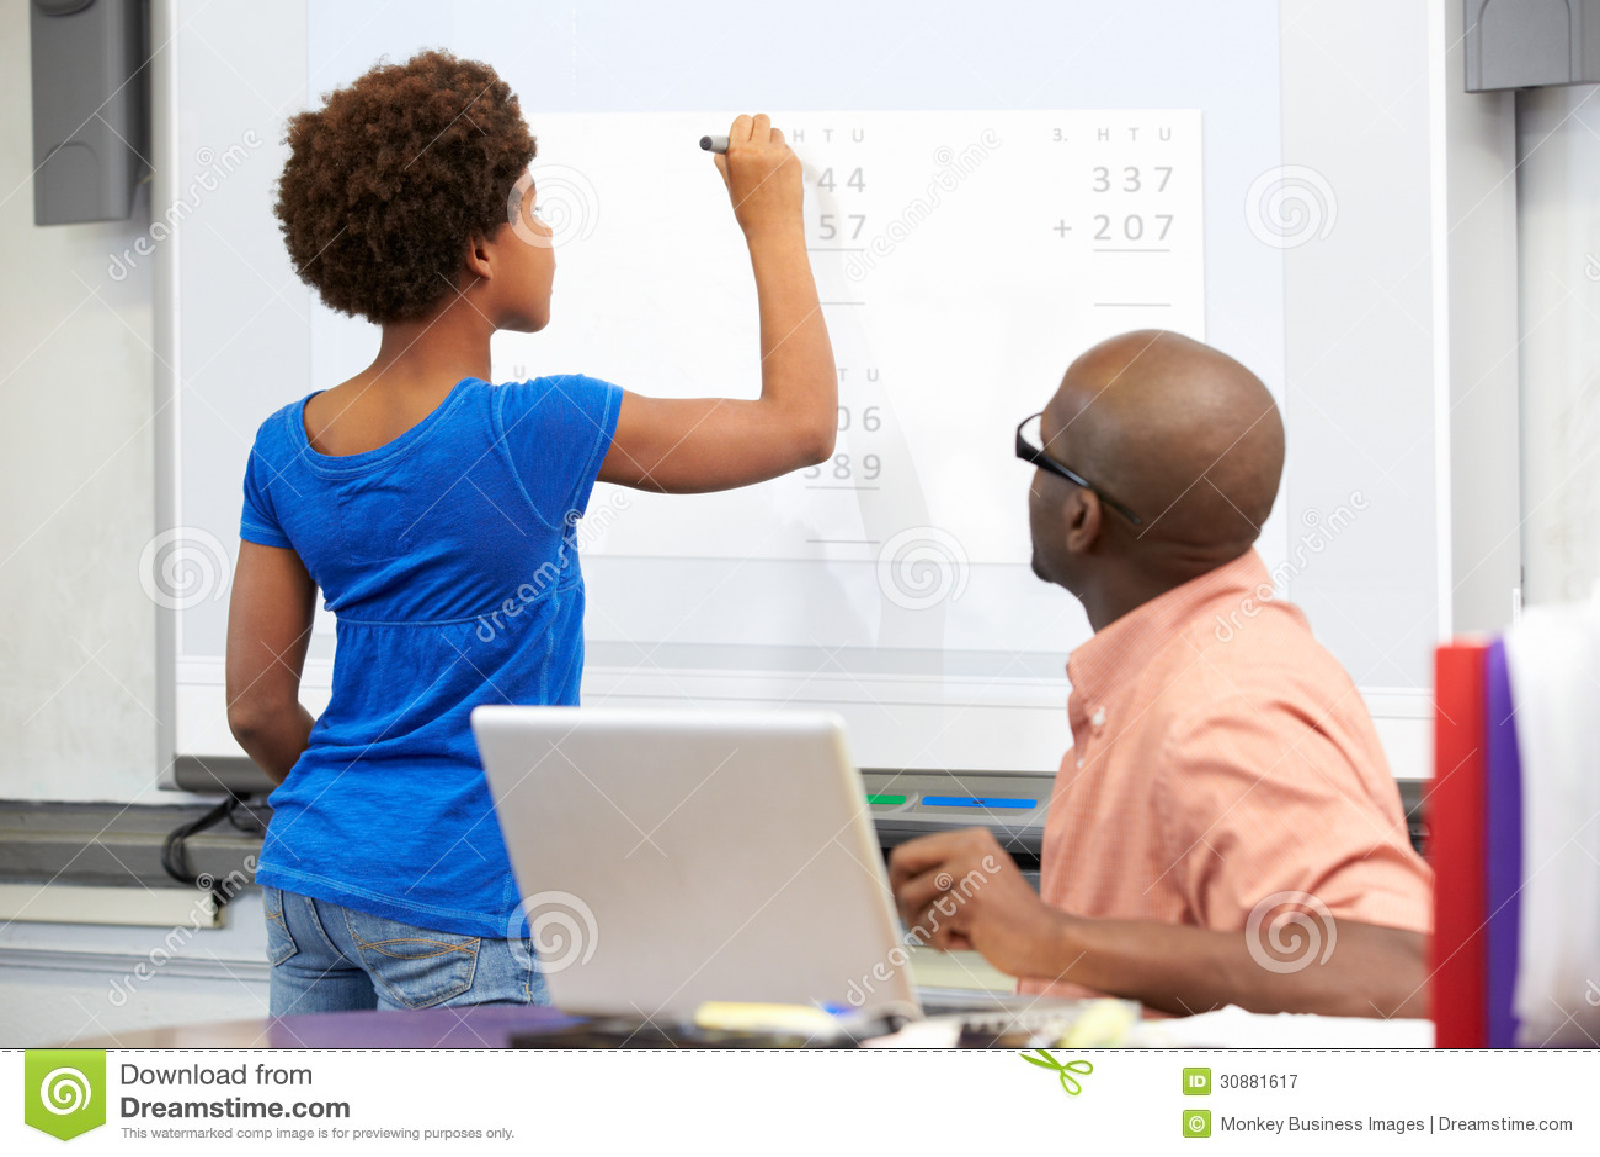 Vrouwelijke Student Writing Answer On Whiteboard